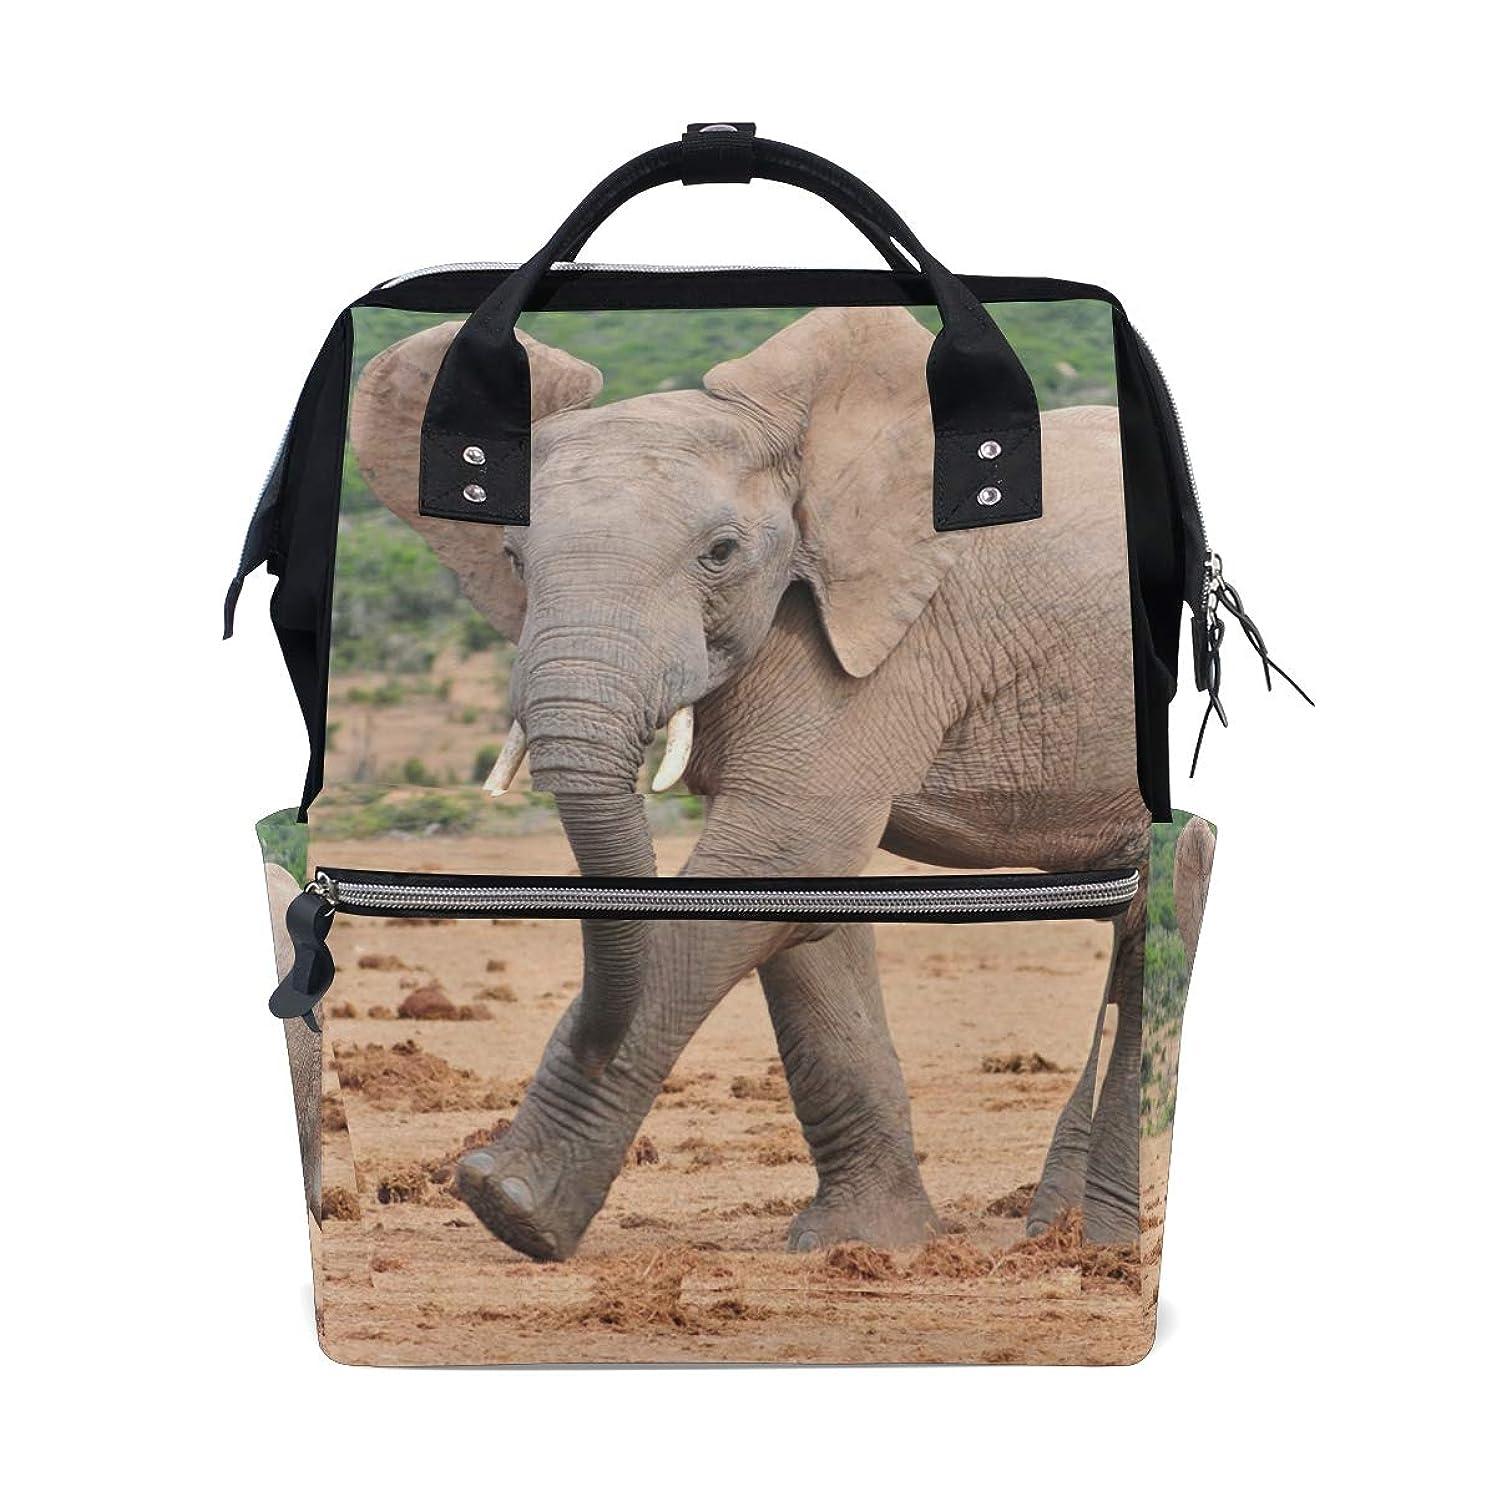 Cute African Elephant School Backpack Large Capacity Mummy Bags Laptop Handbag Casual Travel Rucksack Satchel For Women Men Adult Teen Children